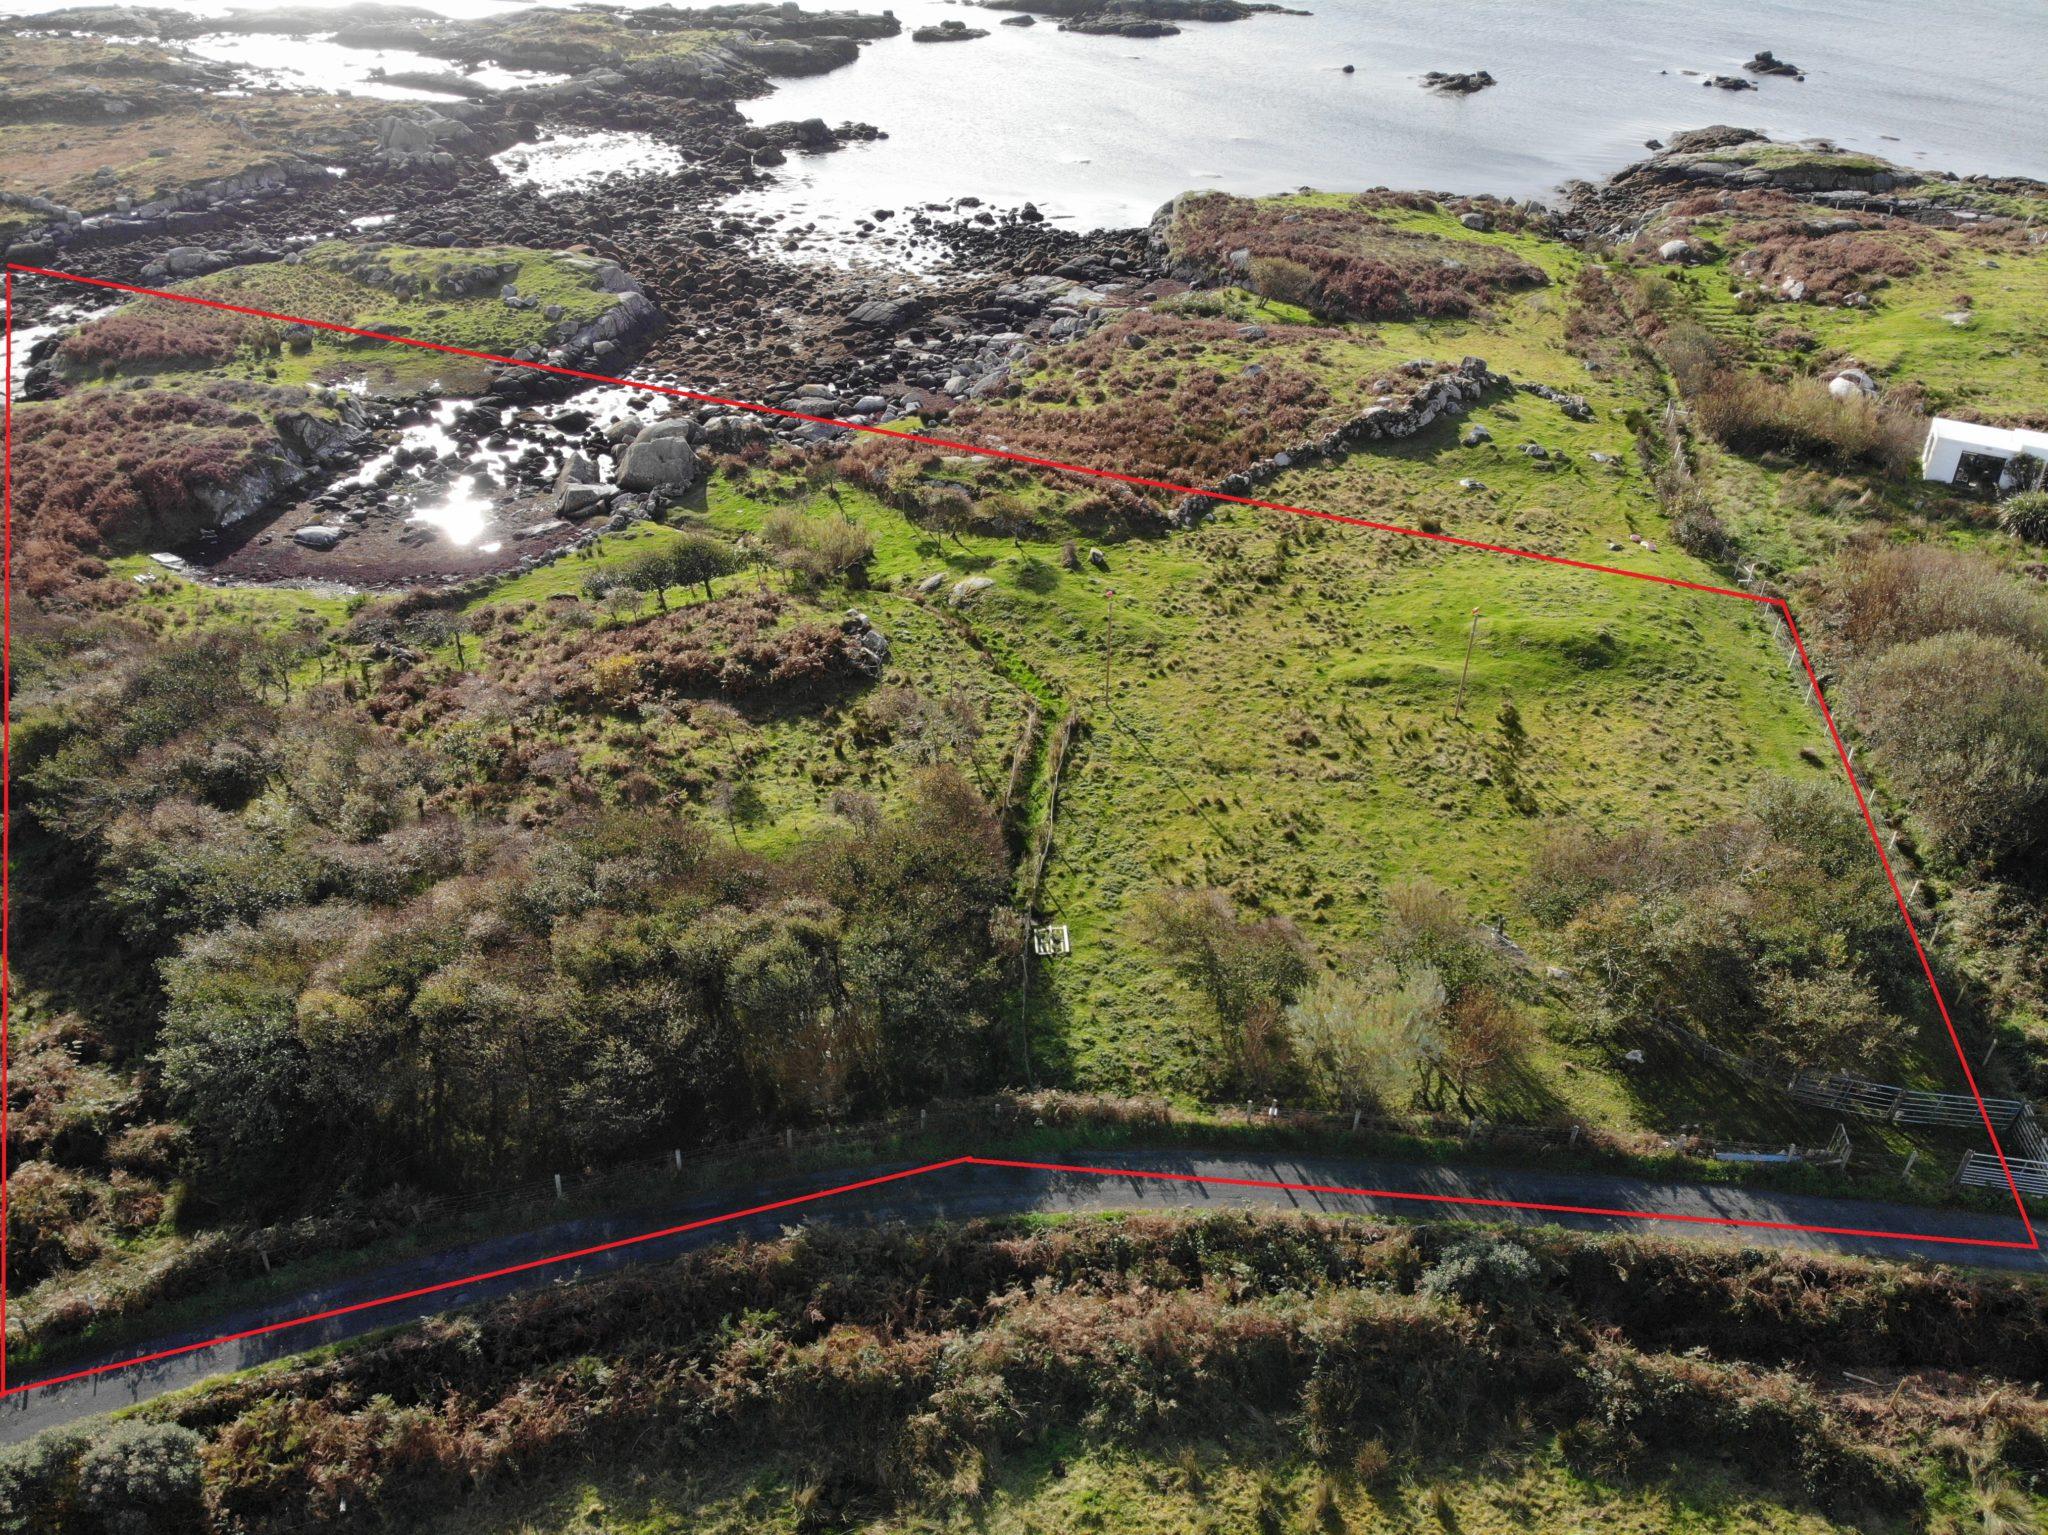 Glasbeggan Burtonport, Co. Donegal -Development Land For Sale – 0.75 acres.